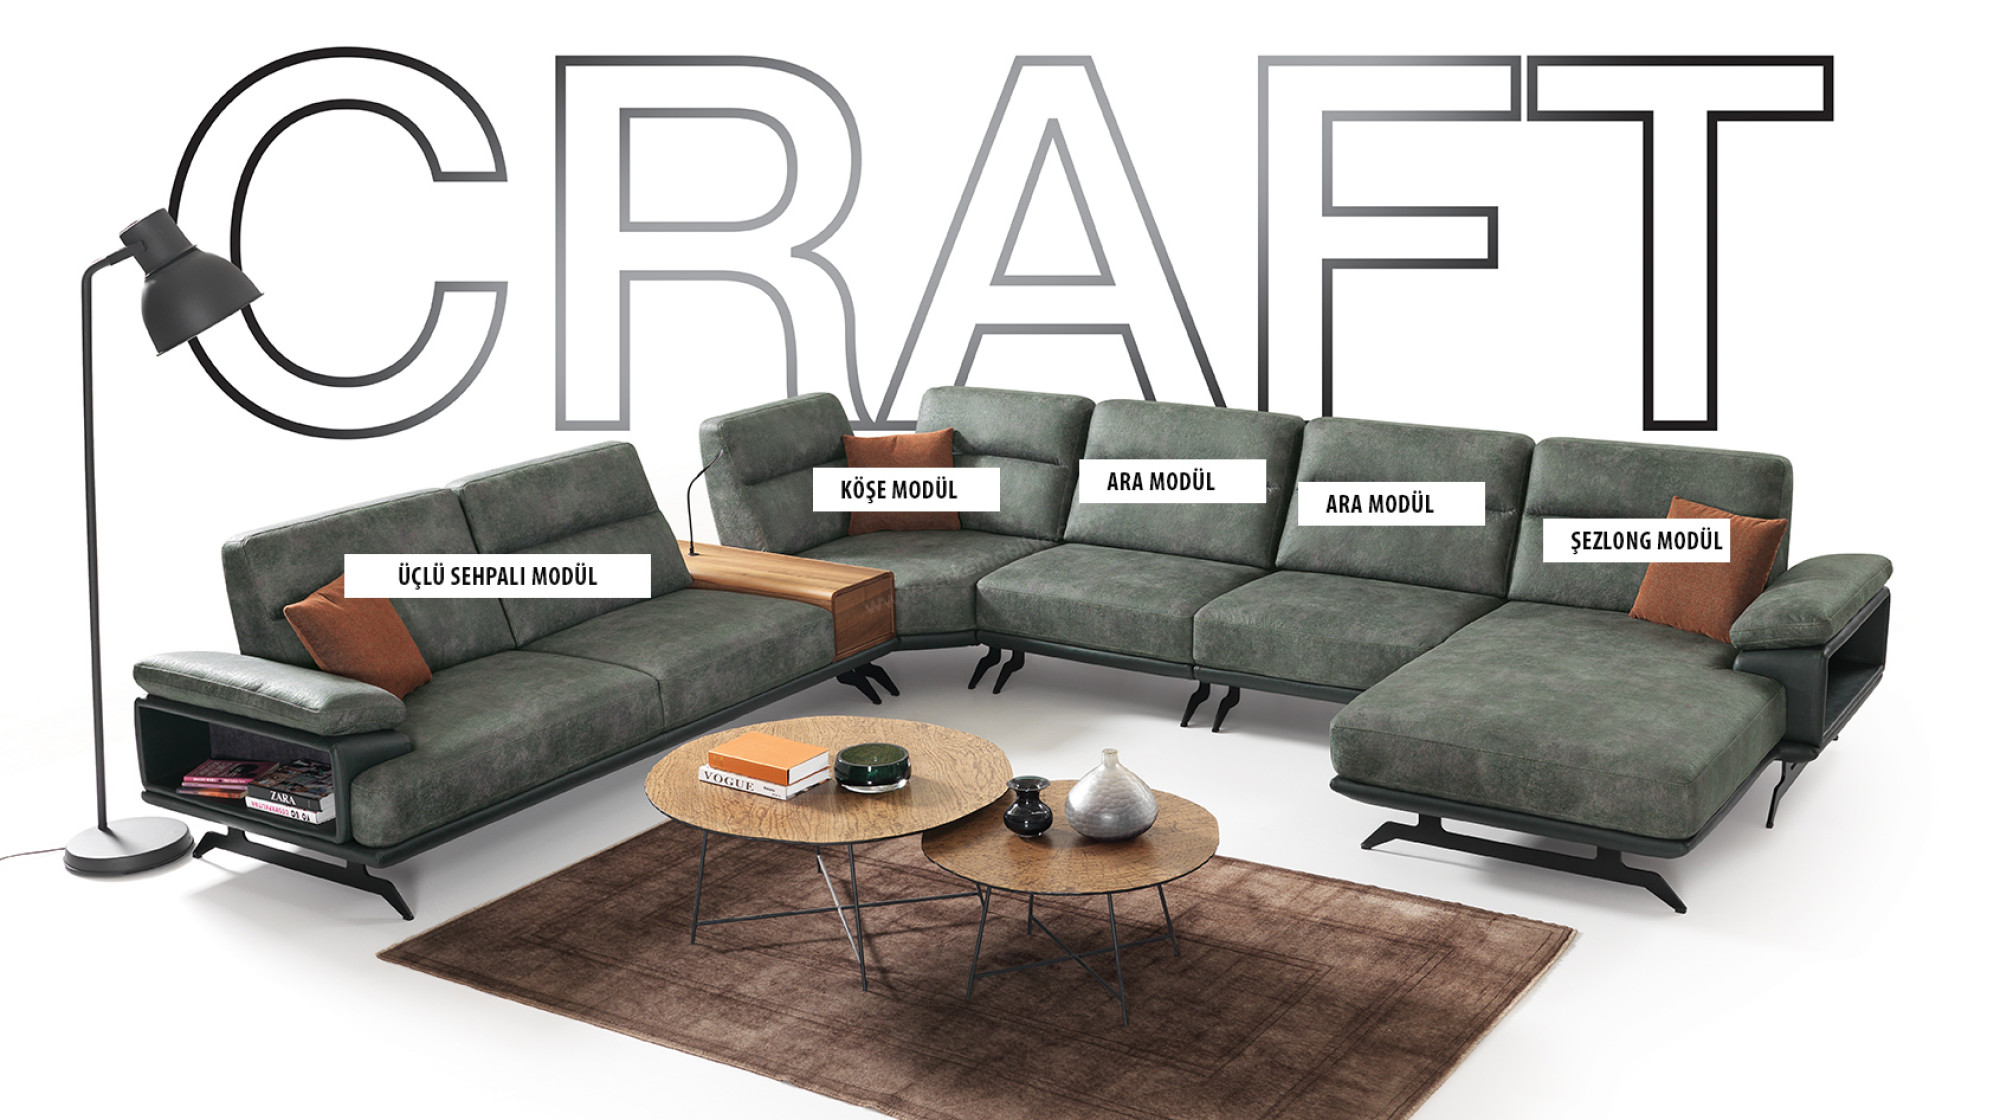 Craft Relax Kose Koltuk Takimi Modern Kose Takimlari Berke Mobilya